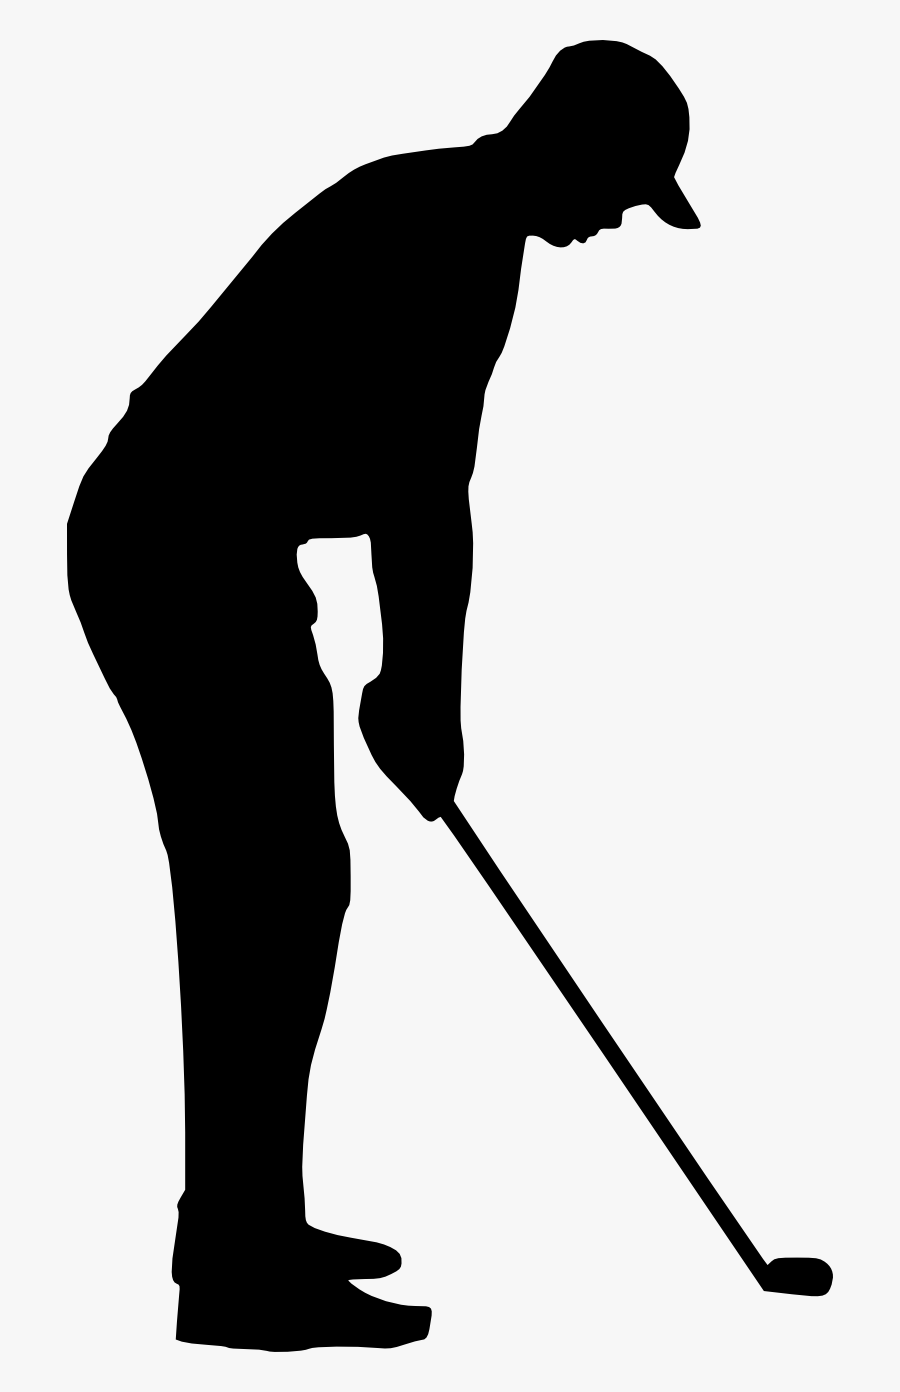 Golfing Clipart Retro Sport - Transparent Black And White Golf Bag Clipart, Transparent Clipart